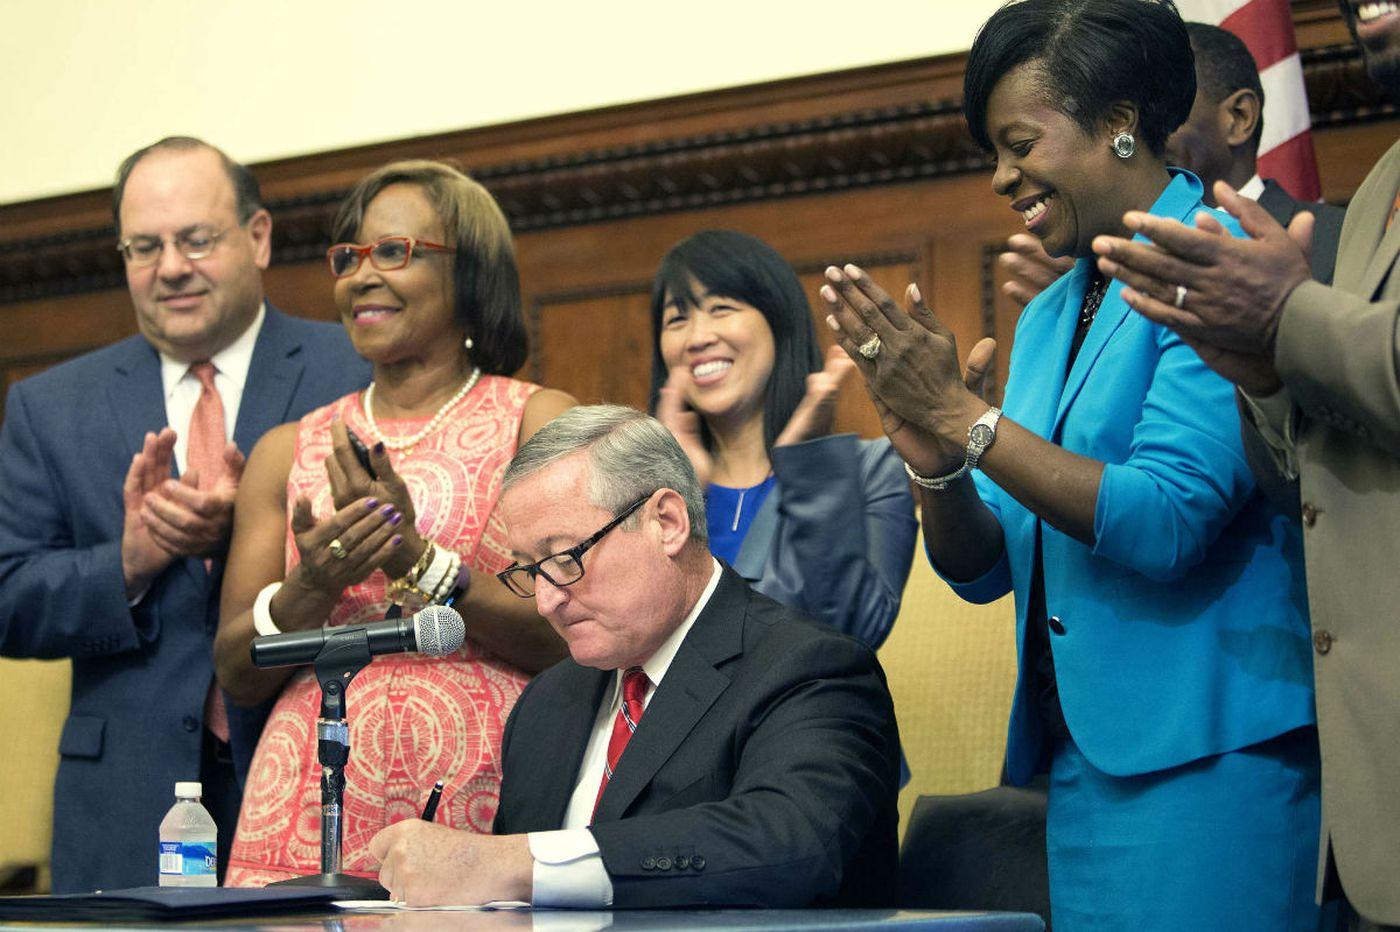 City rolls out 'soda tax' enforcement plan